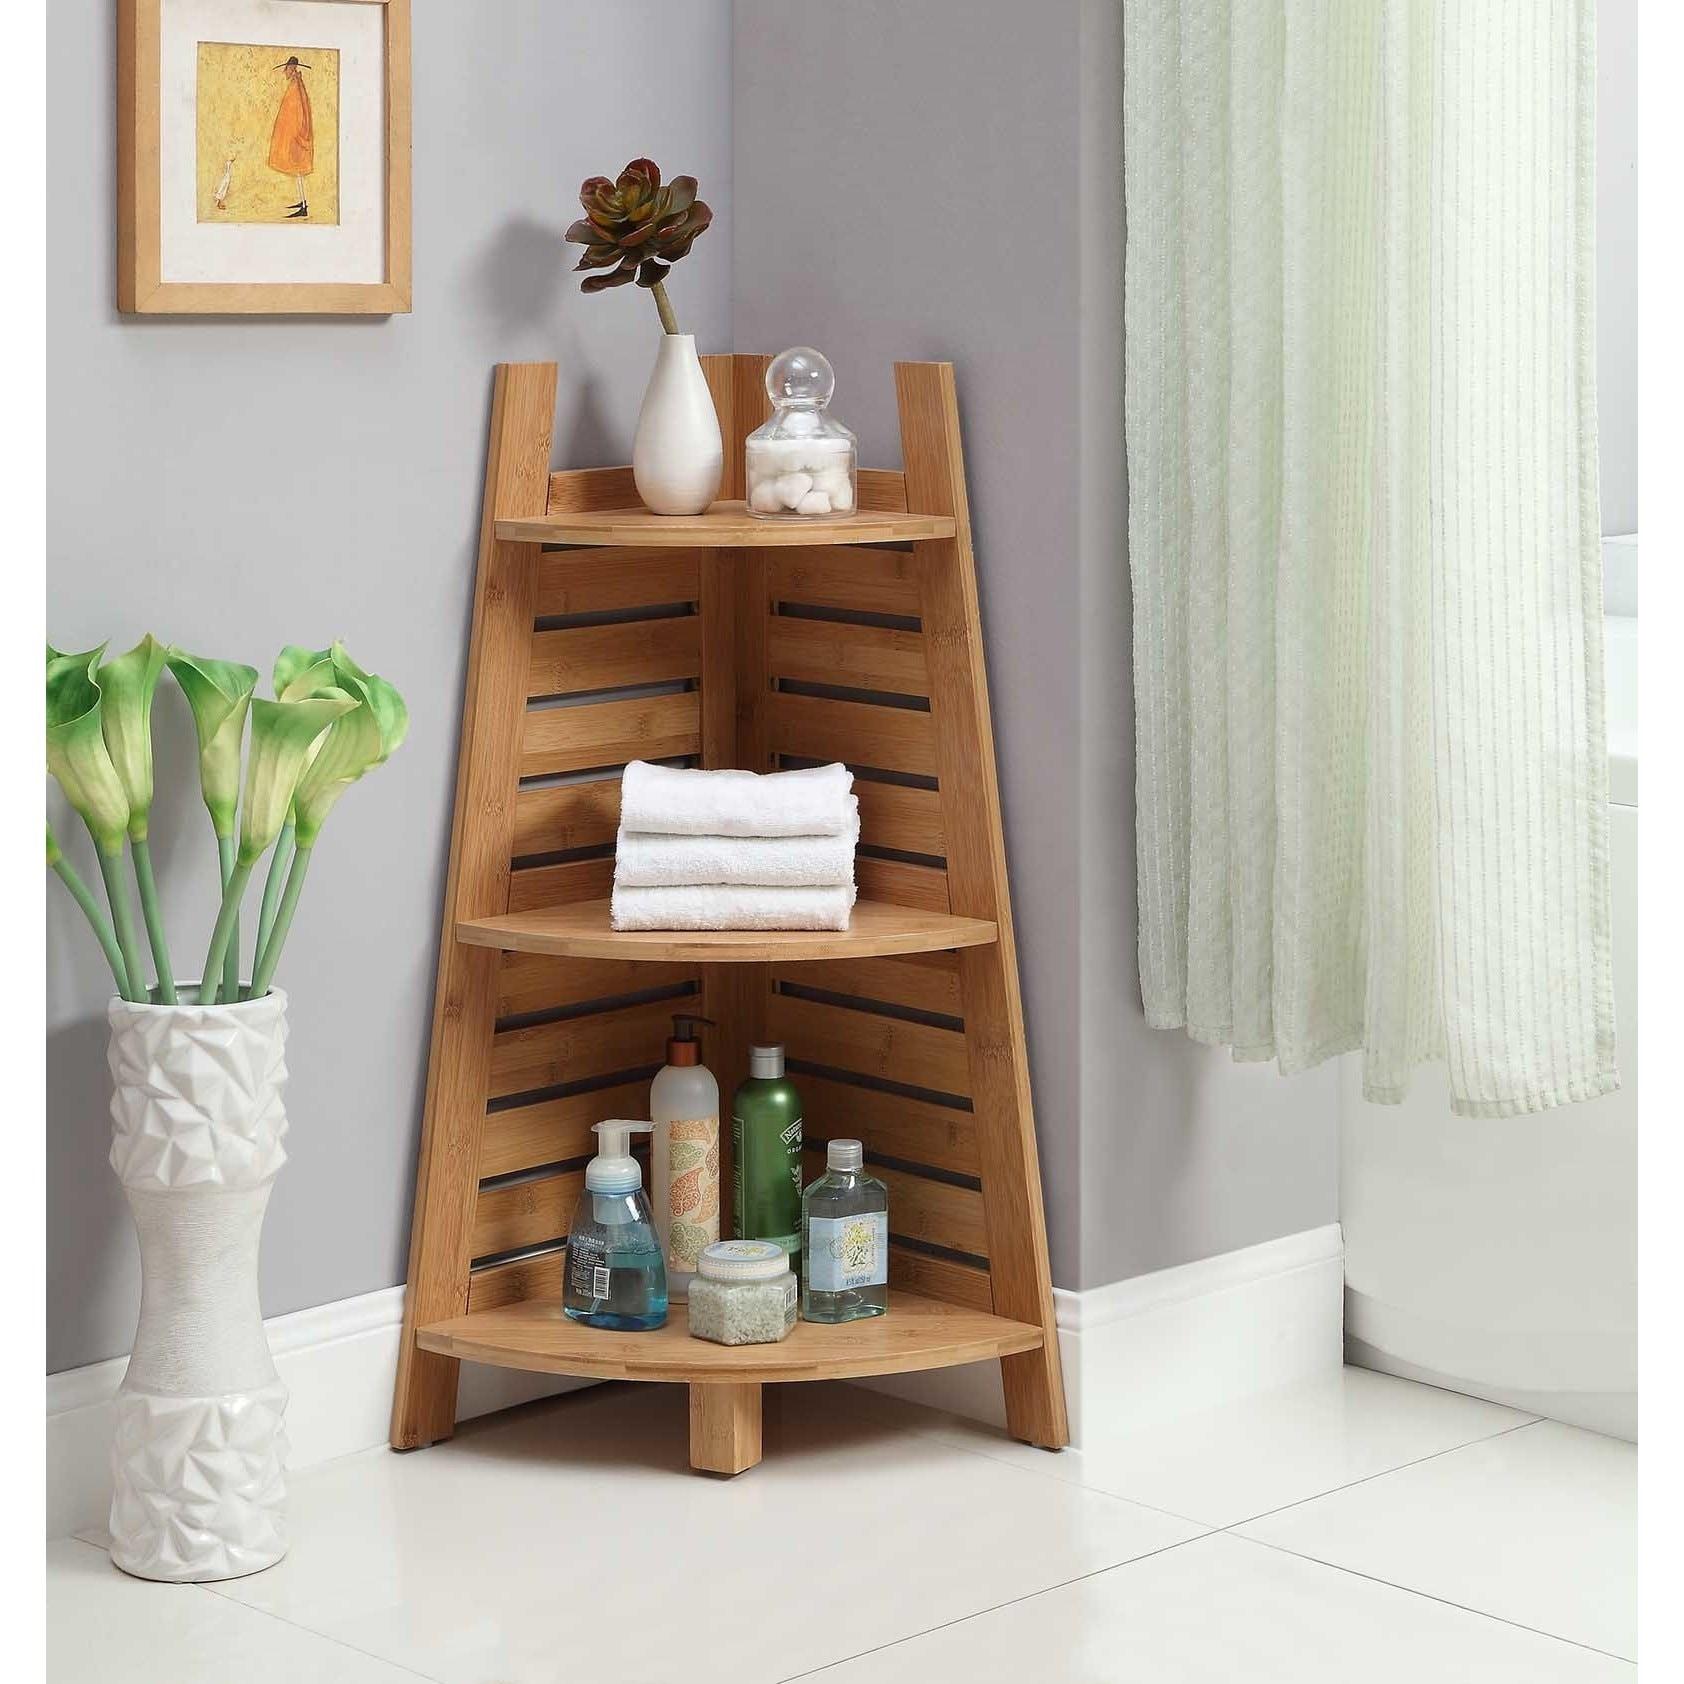 basket inc living bamboo shelf k laundry best wayfair